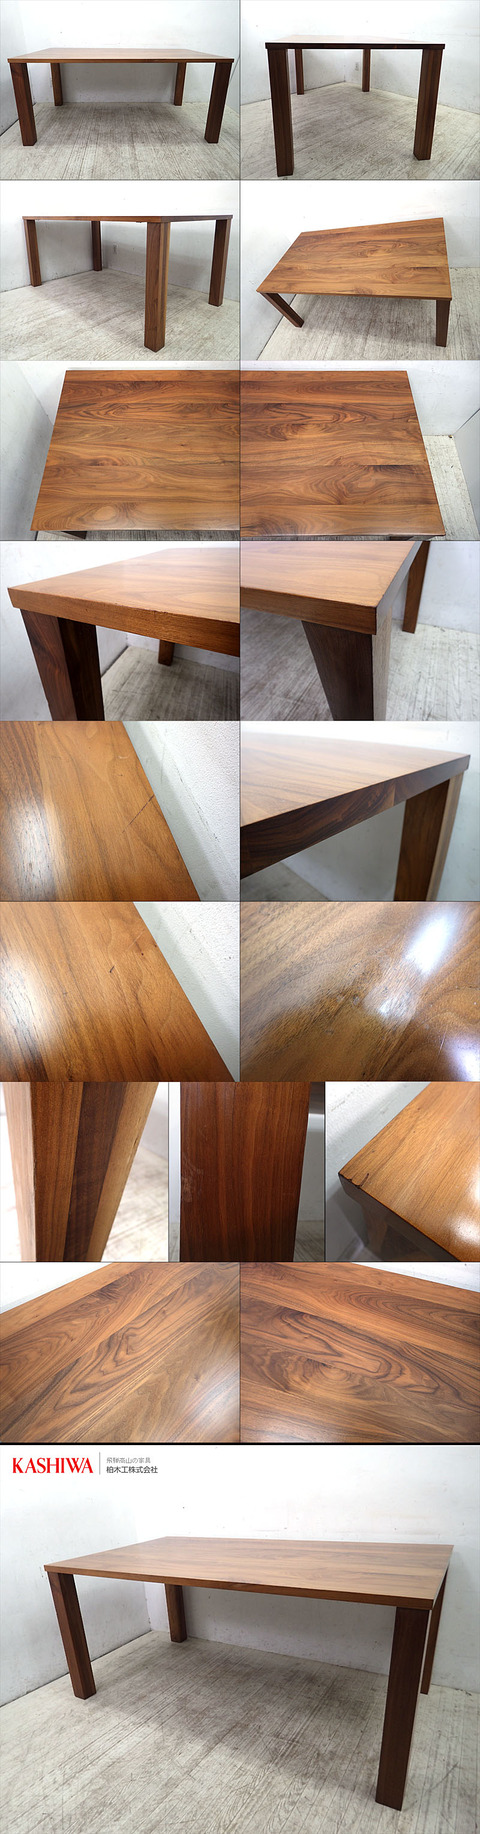 kashiwa walnut dining table 2015 12 27 2